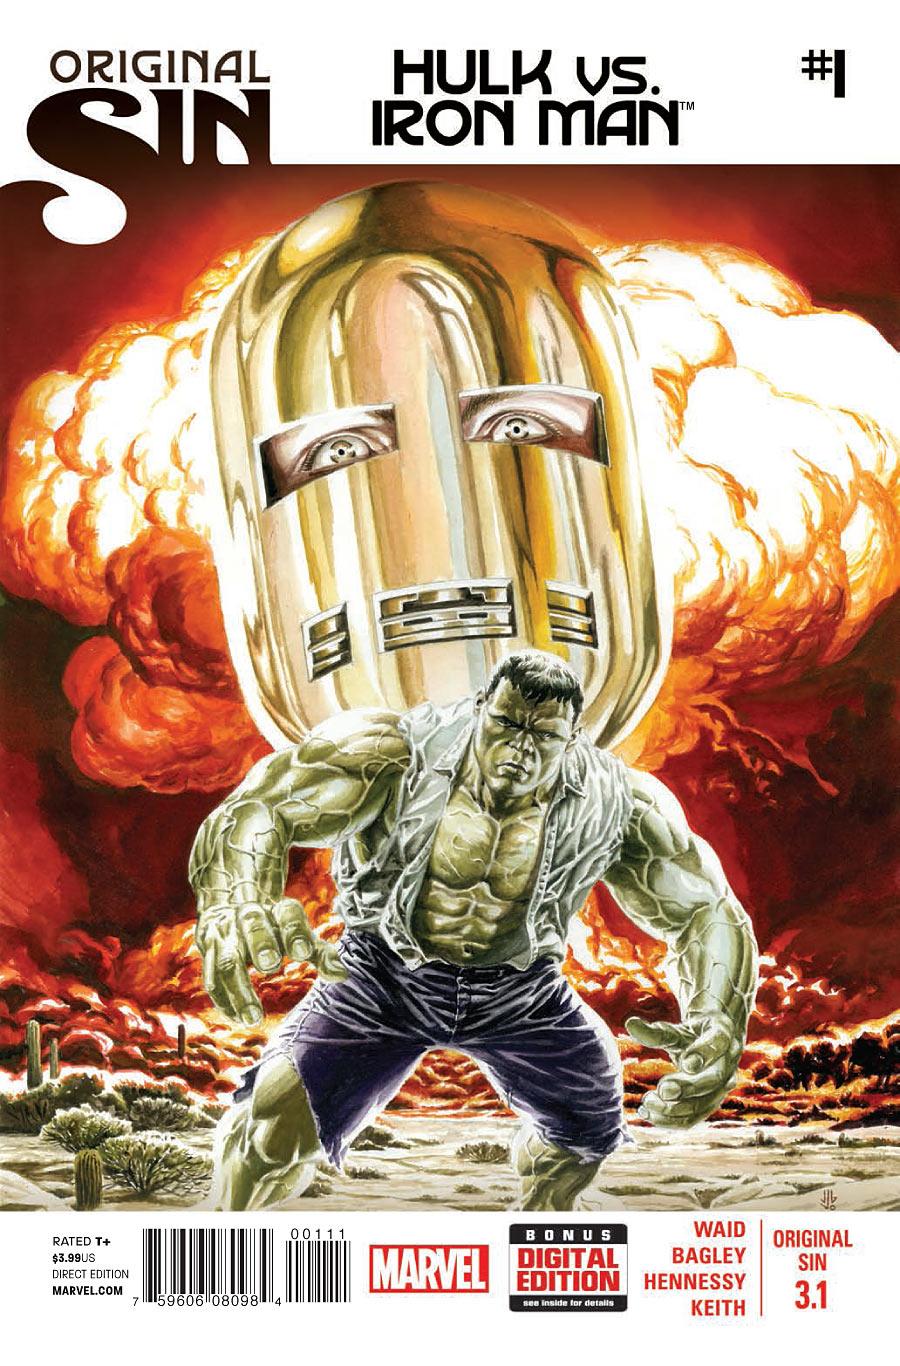 Original Sin 3.1 - Hulk Vs. Iron Man #1